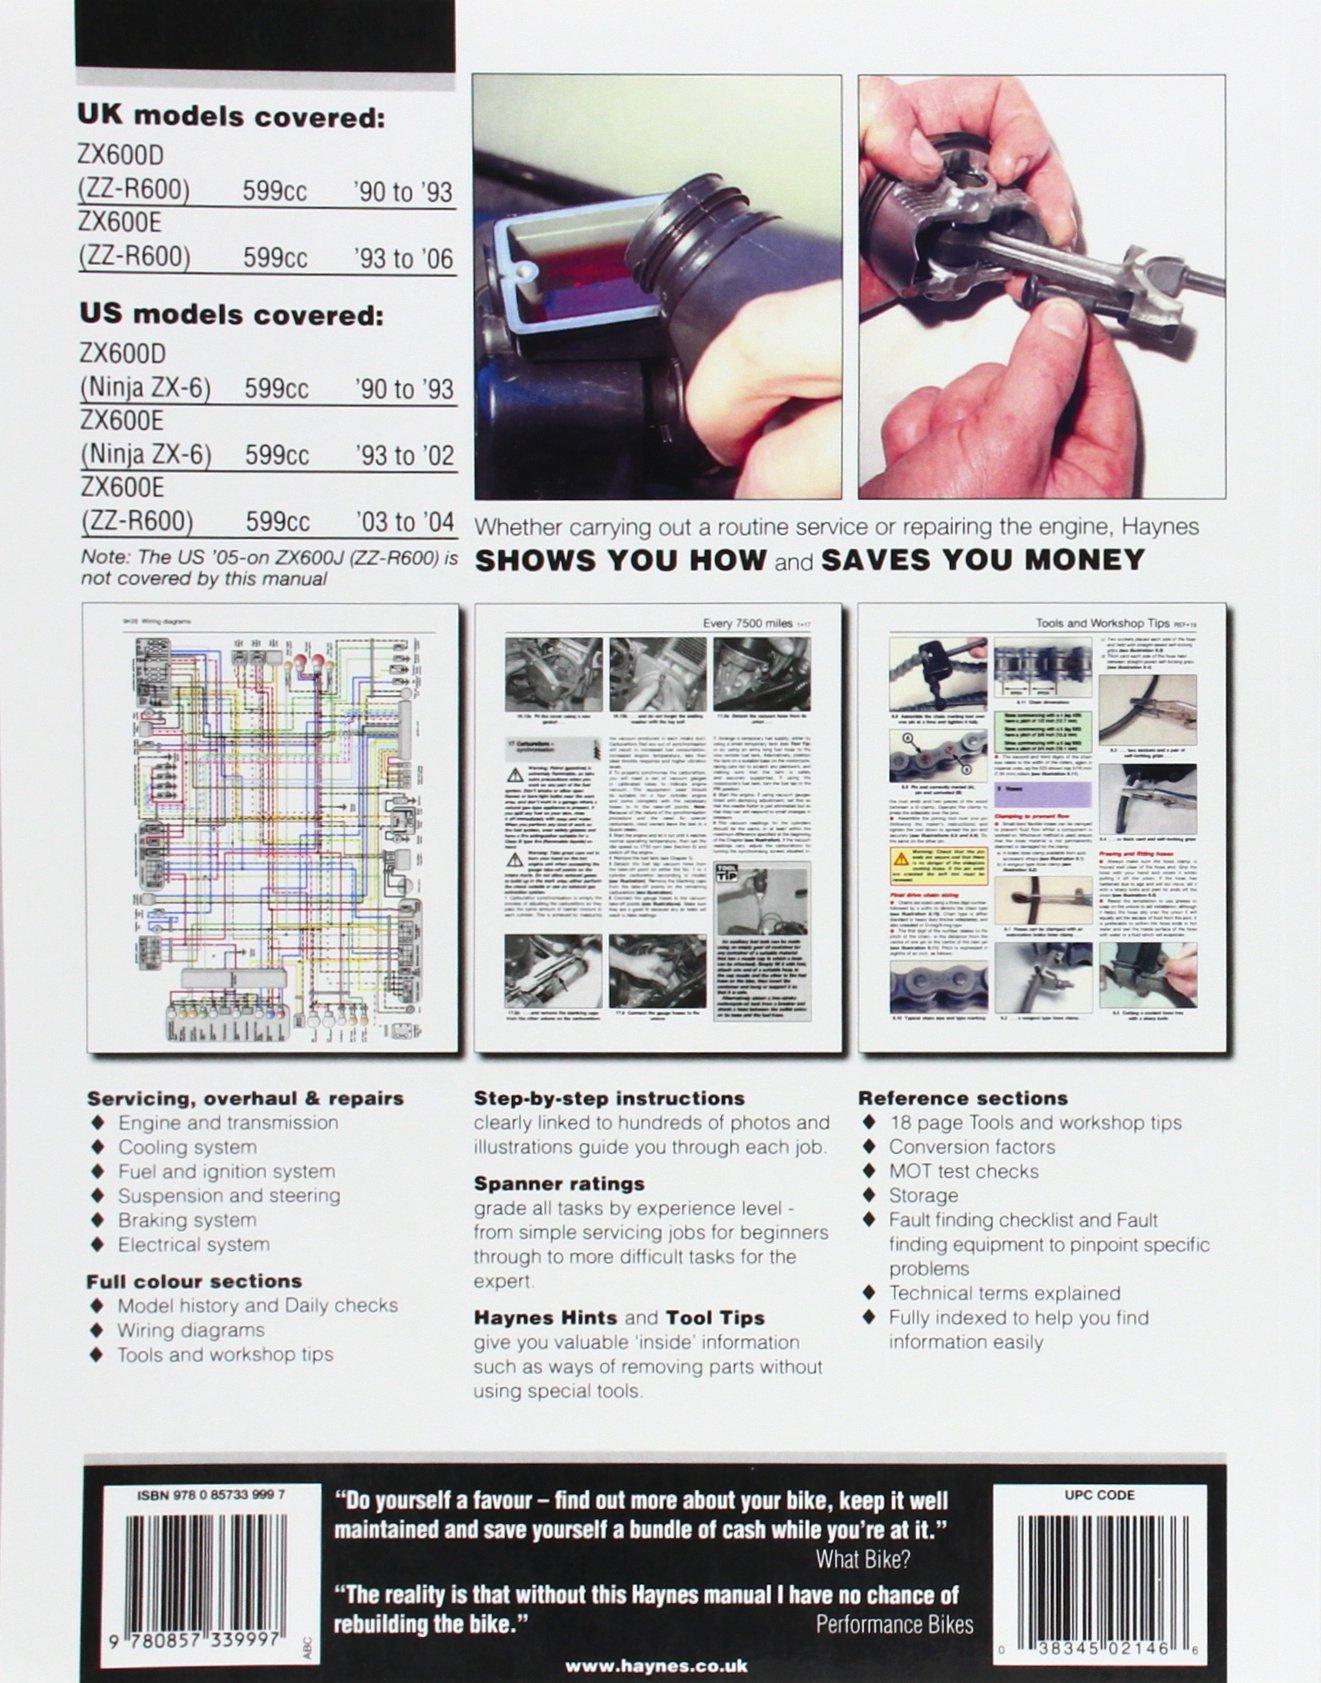 Kawasaki Zx600 Zz R600 Ninja Zx 6 90 To 06 Haynes Service Wiring Diagram Repair Manual Editors Of Manuals 9780857339997 Books